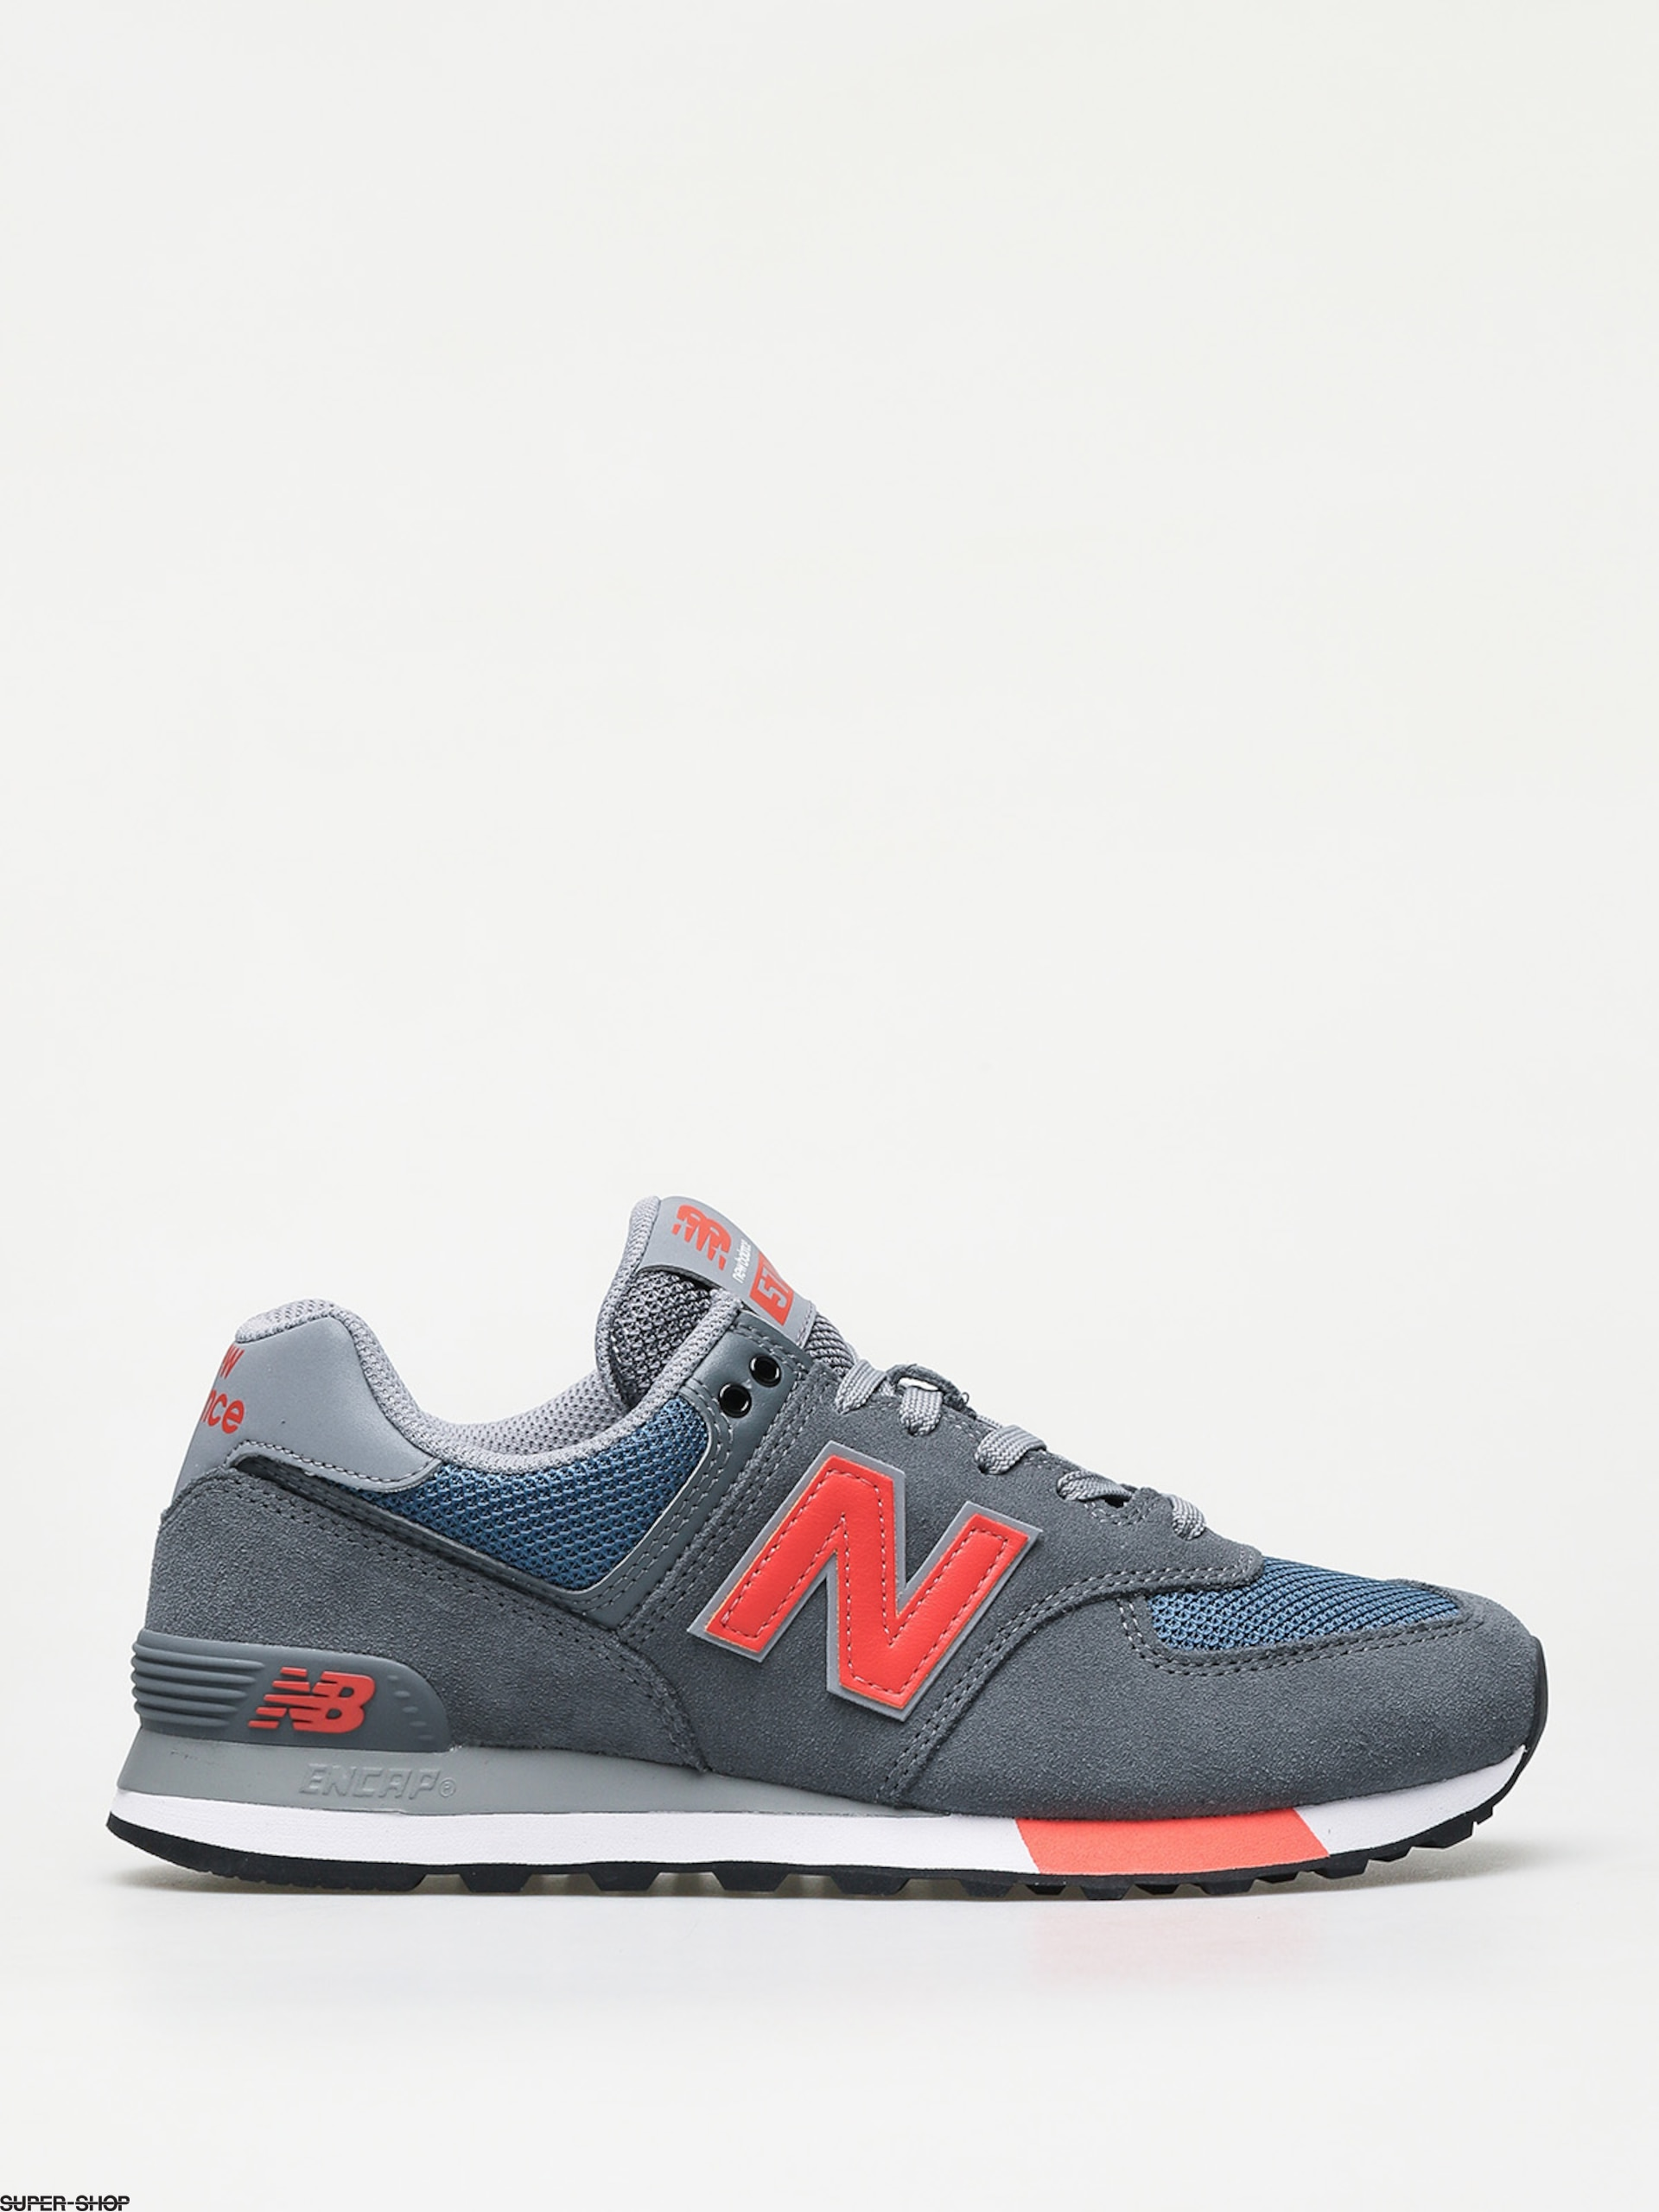 New Balance 574 Shoes (grey/blue)